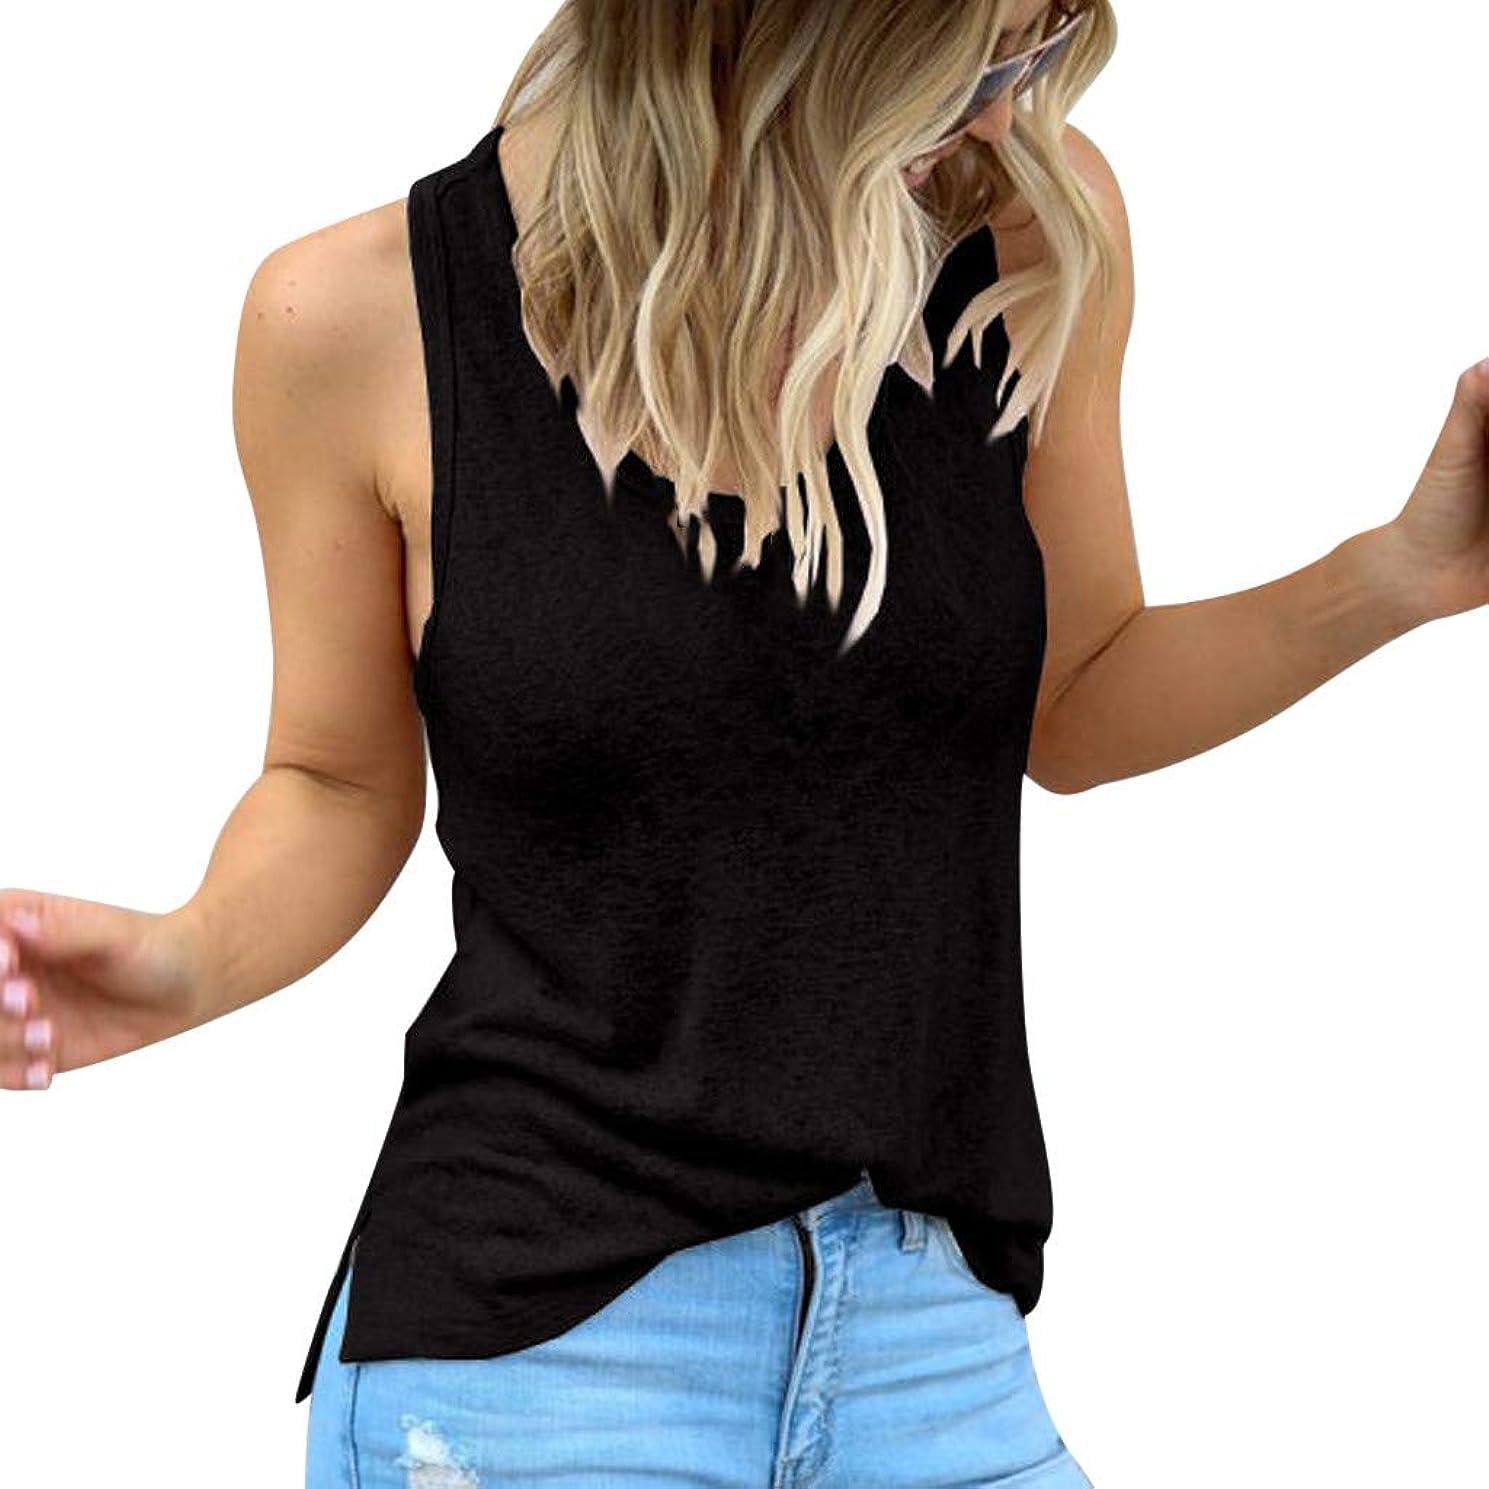 Cewtolkar Women Summer Tank Tops Round Neck Sleeveless Vest Shirt Casual Tunic Camisole Party Blouse